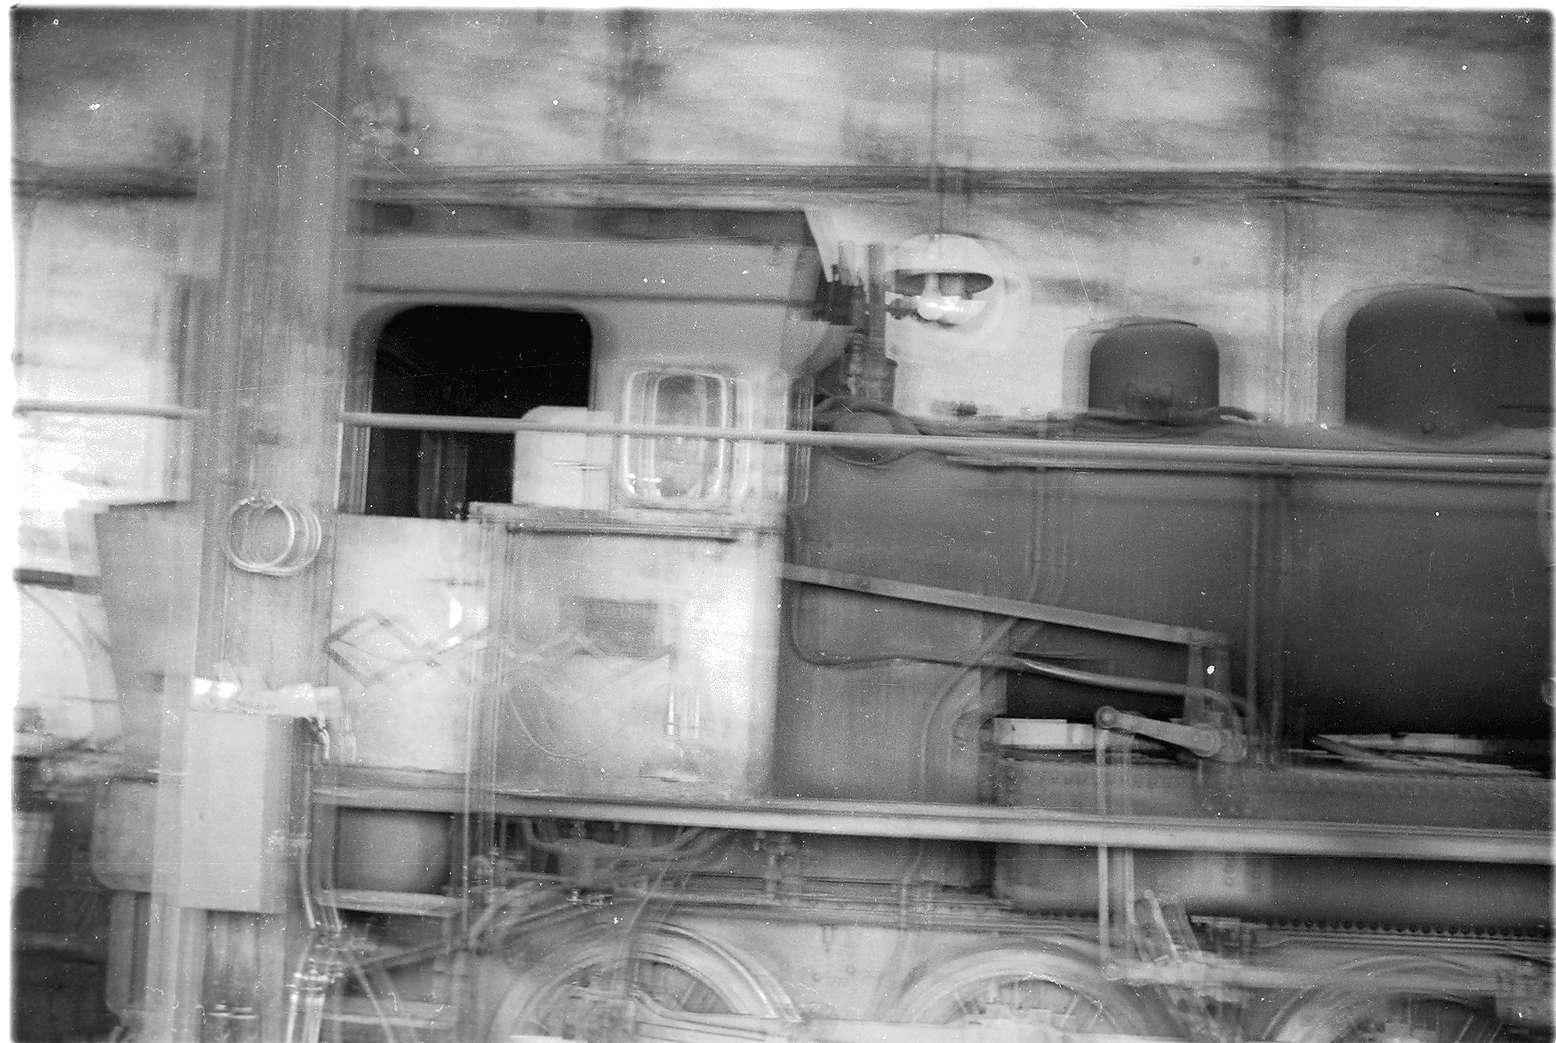 Gammertingen, Bahnbetriebswerkstätte, Schuppen 1, Lok 141 (1929 - 1965), ELNA-Type 1